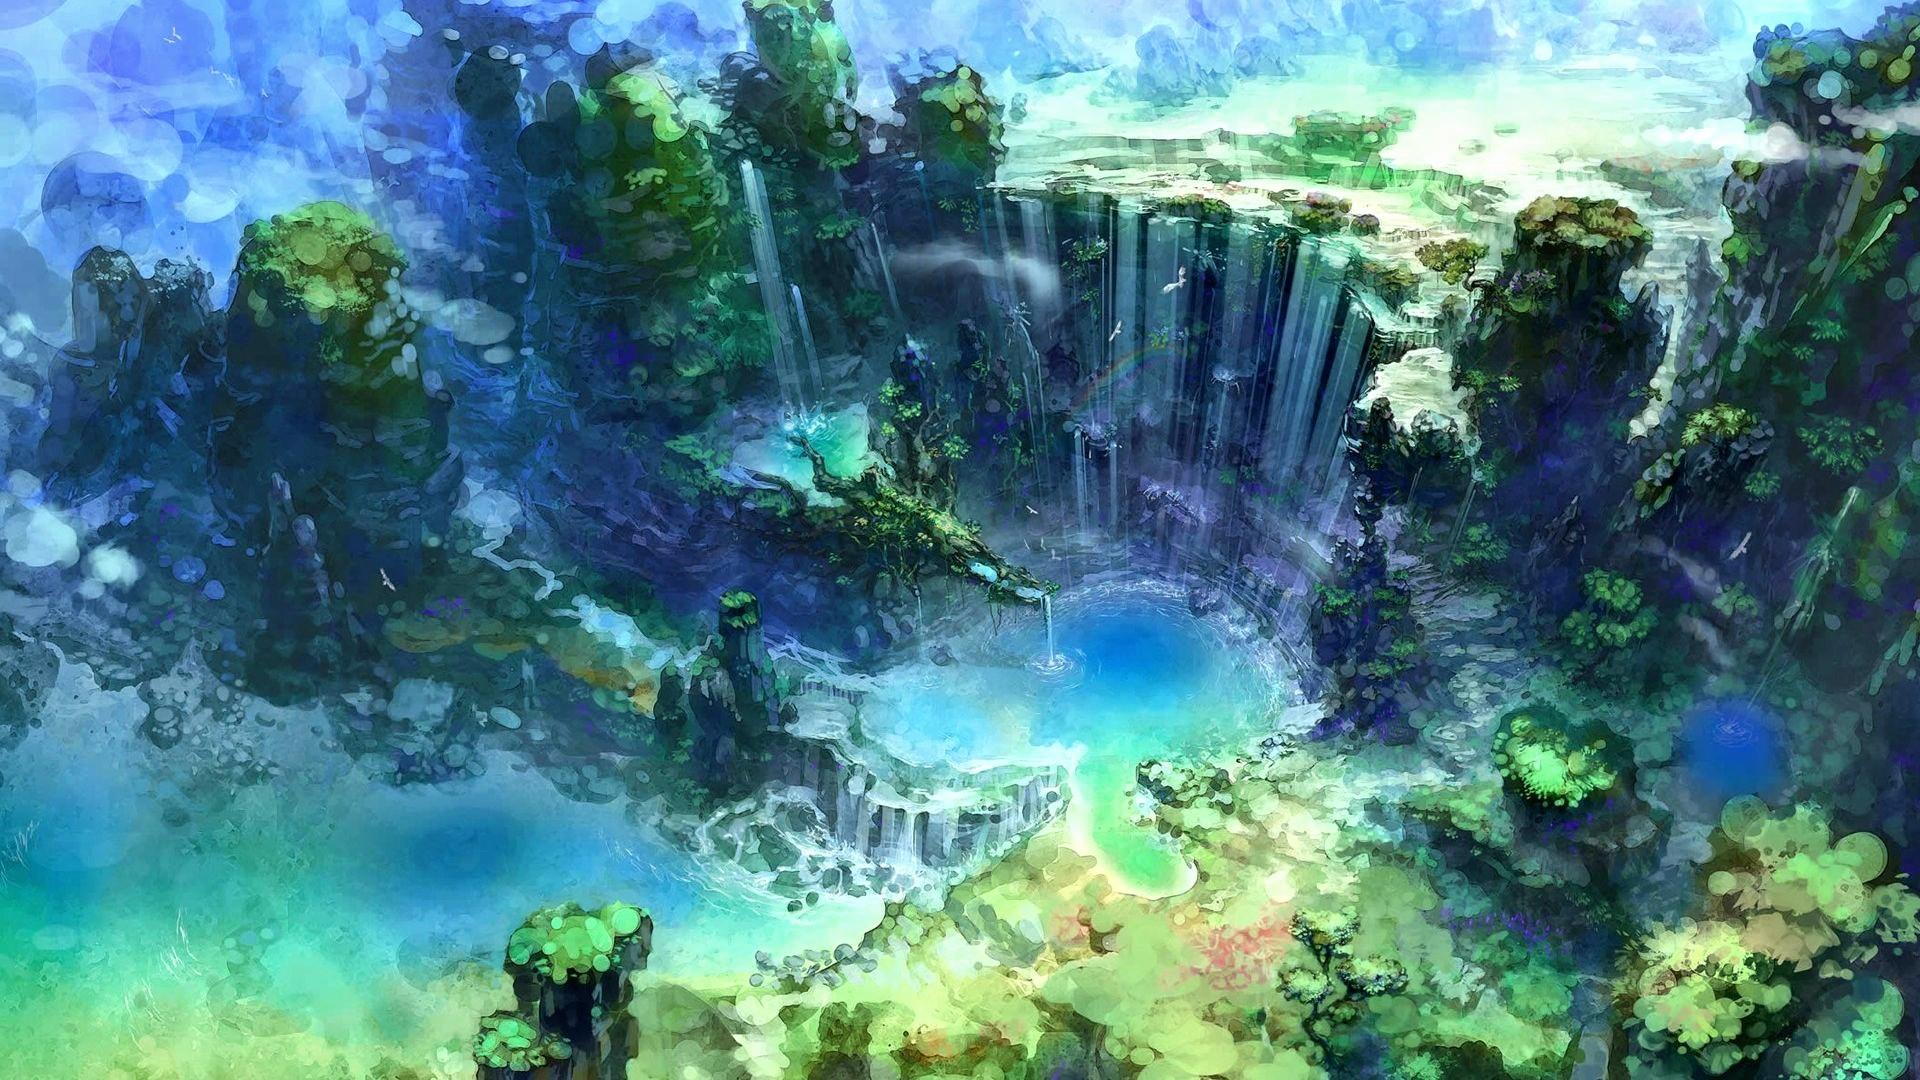 Res: 1920x1080, anime scenery hd wallpaper